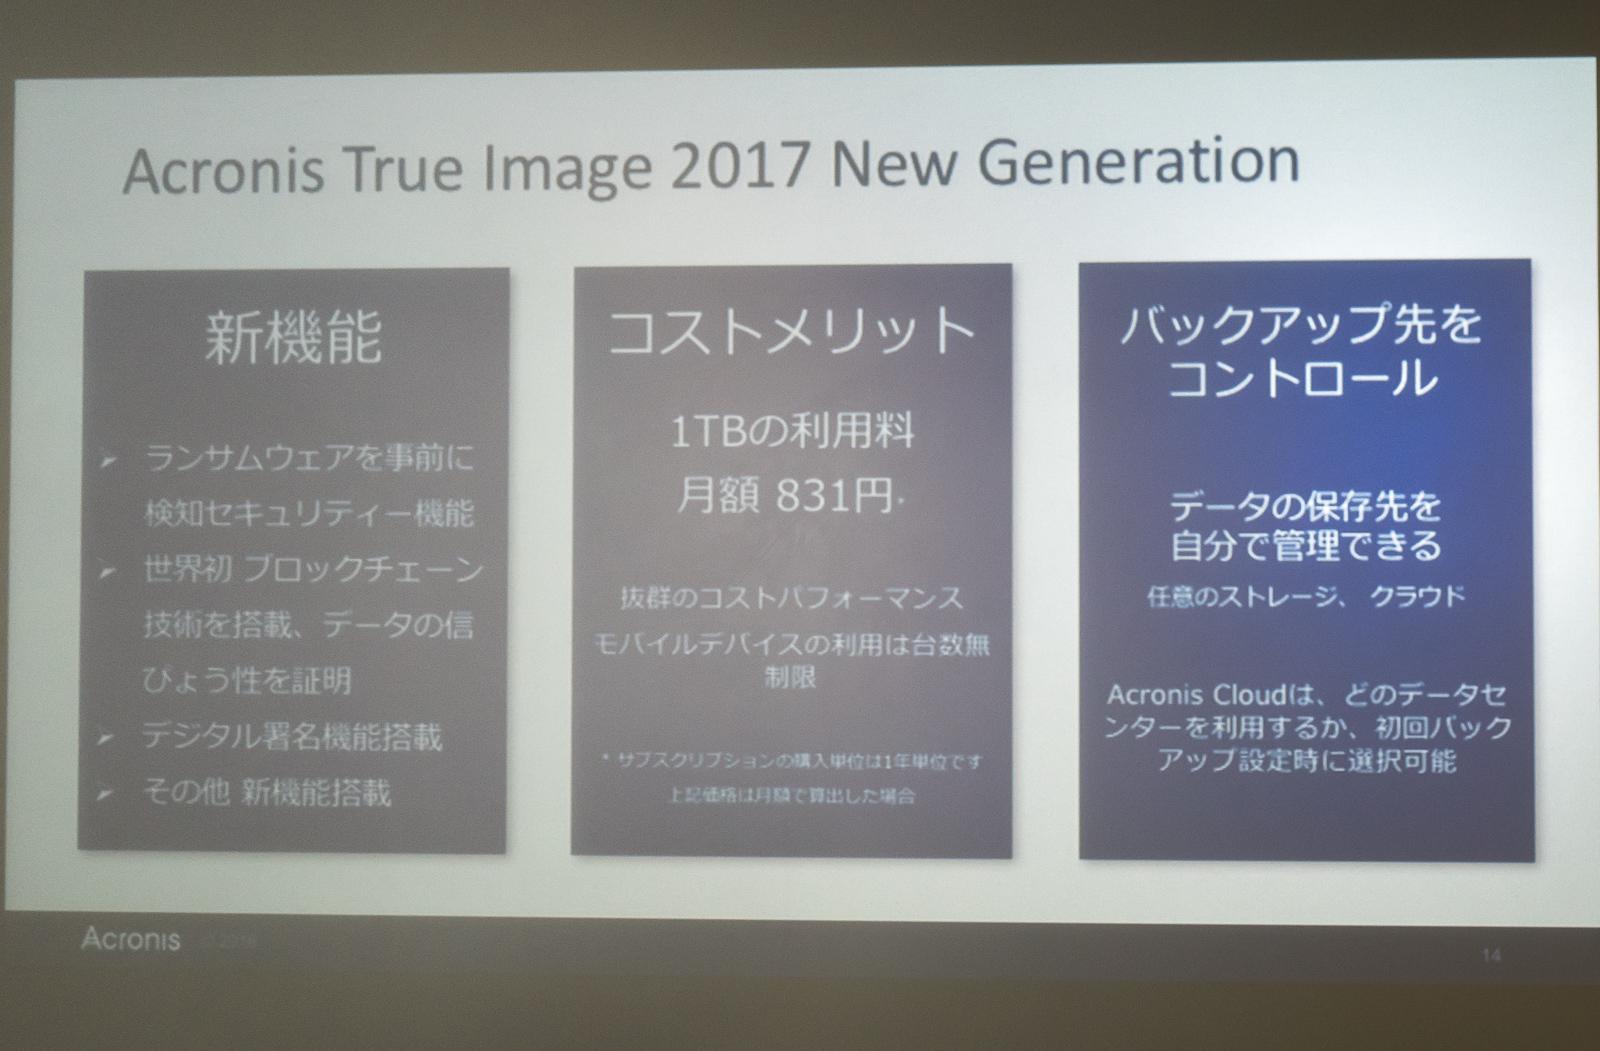 New Generationの新機能と特徴